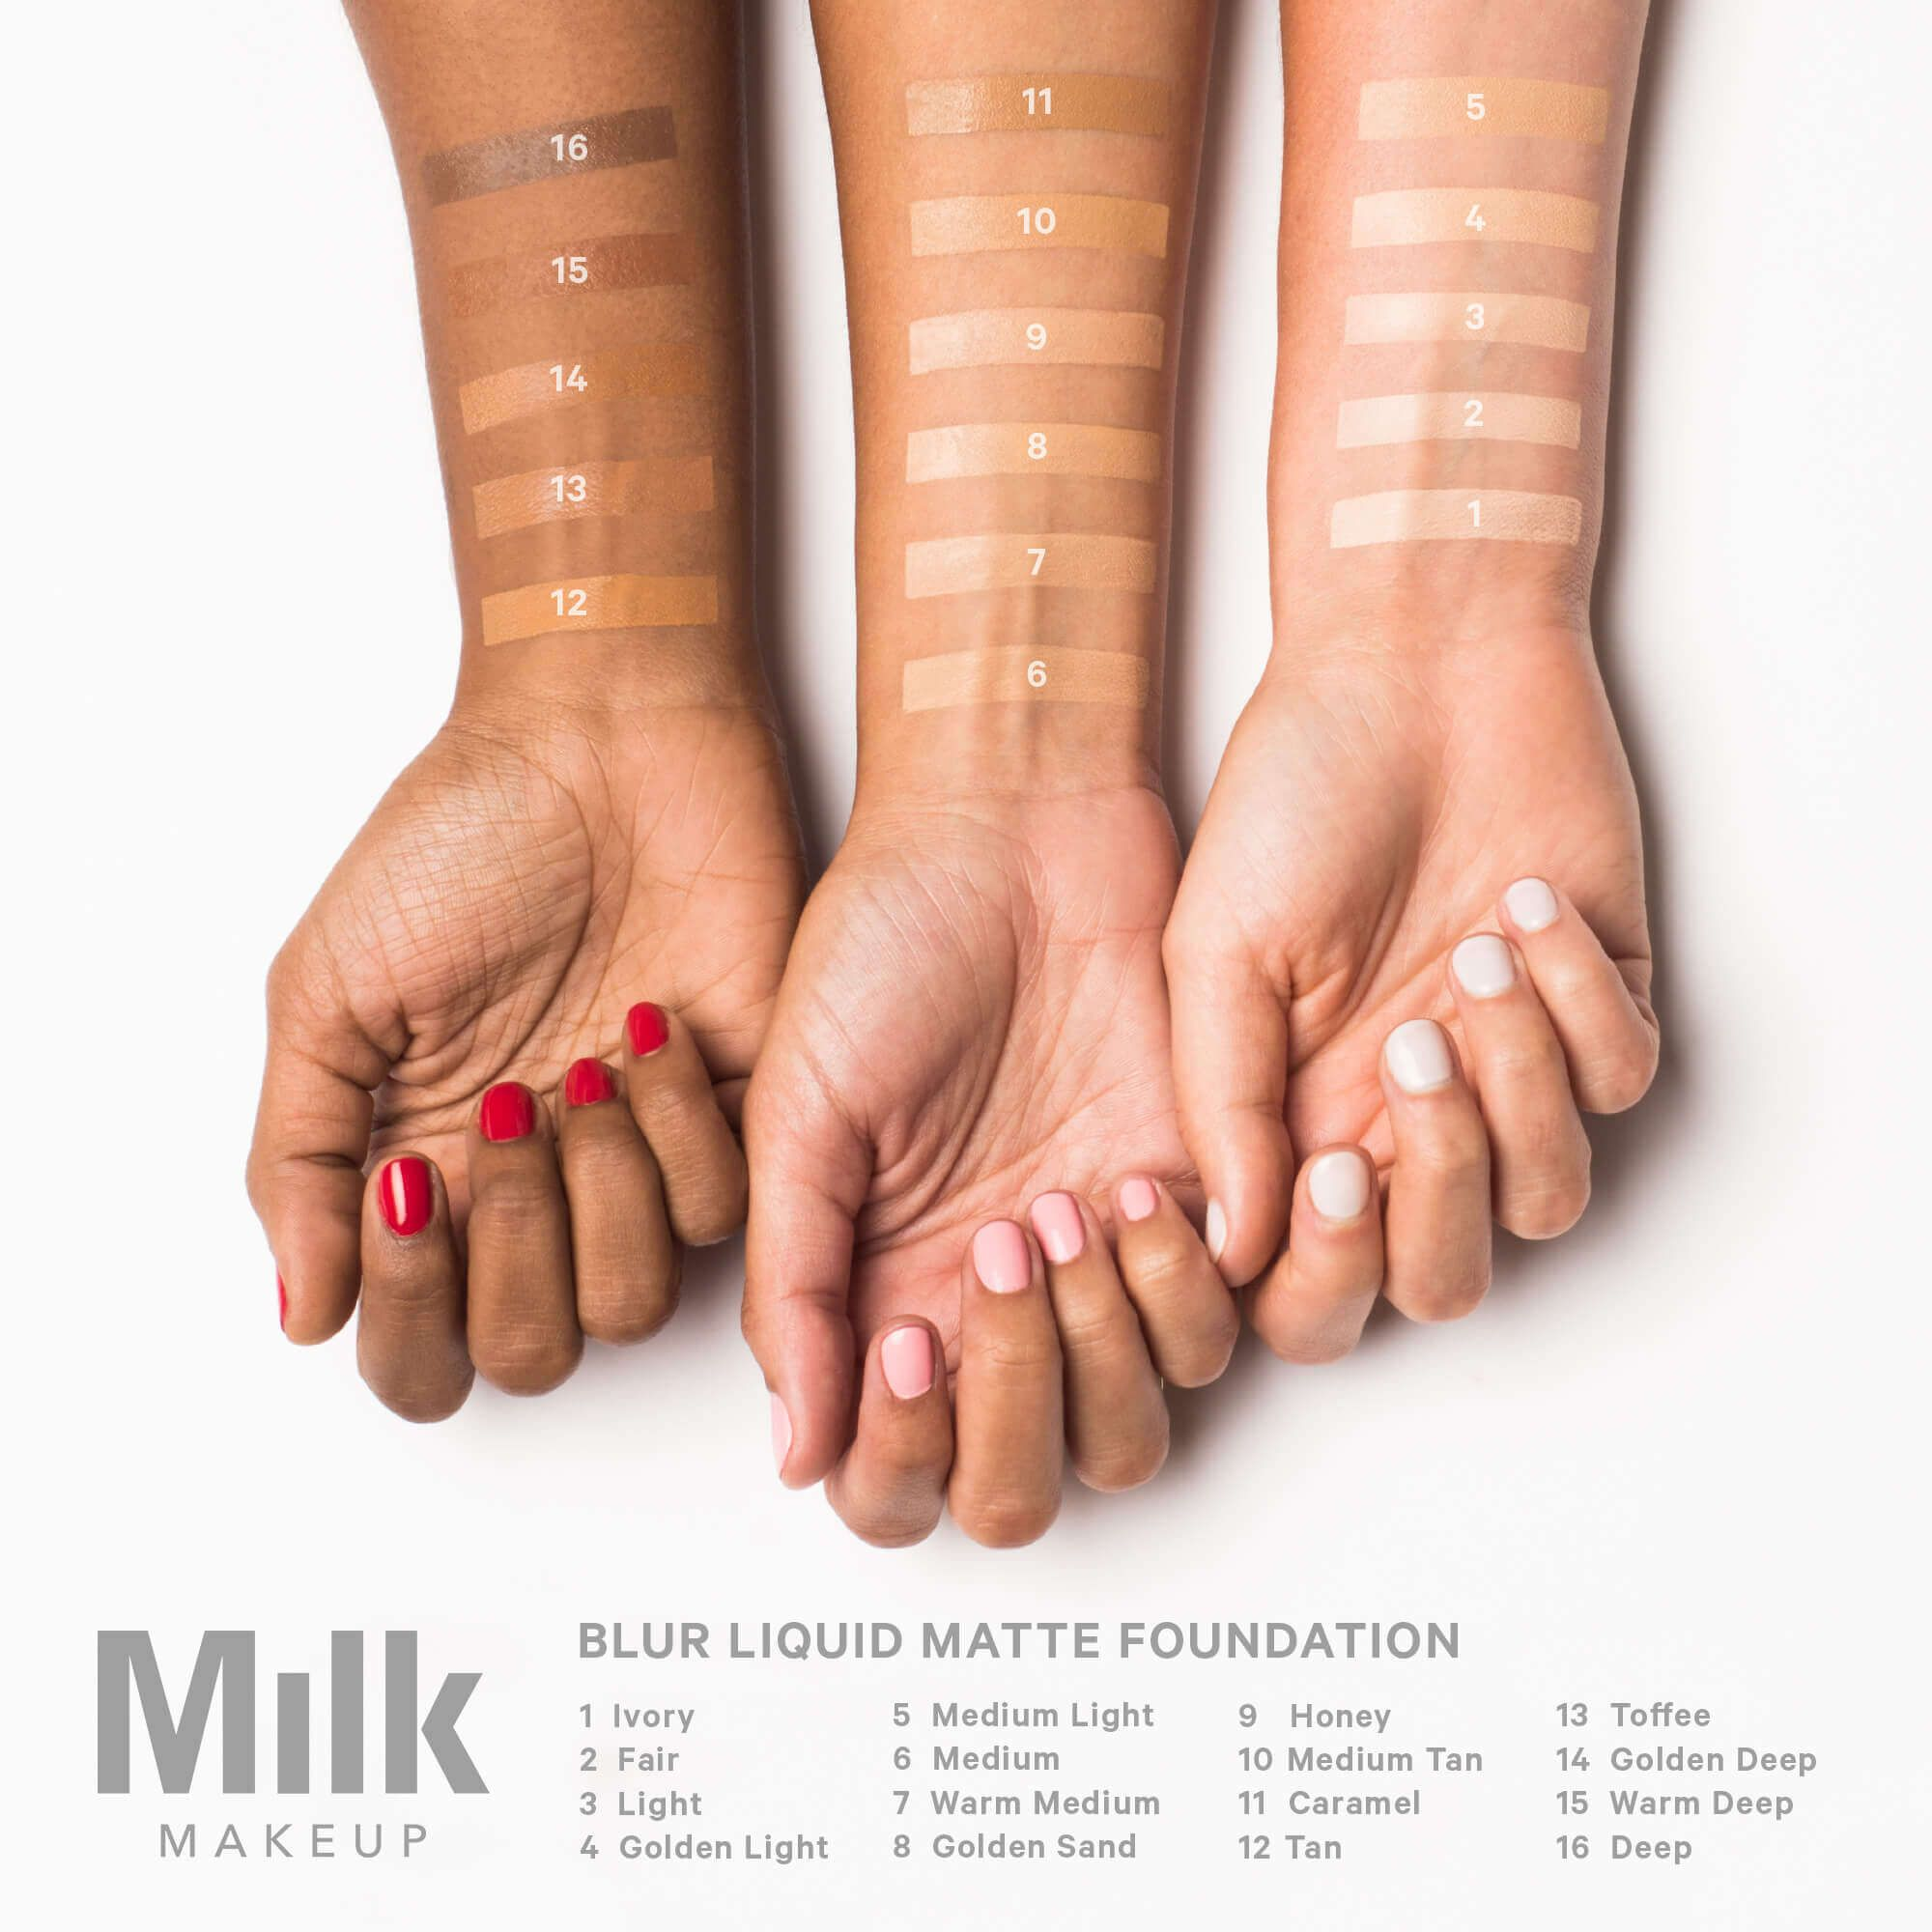 Blur Liquid Matte Foundation Milk makeup foundation